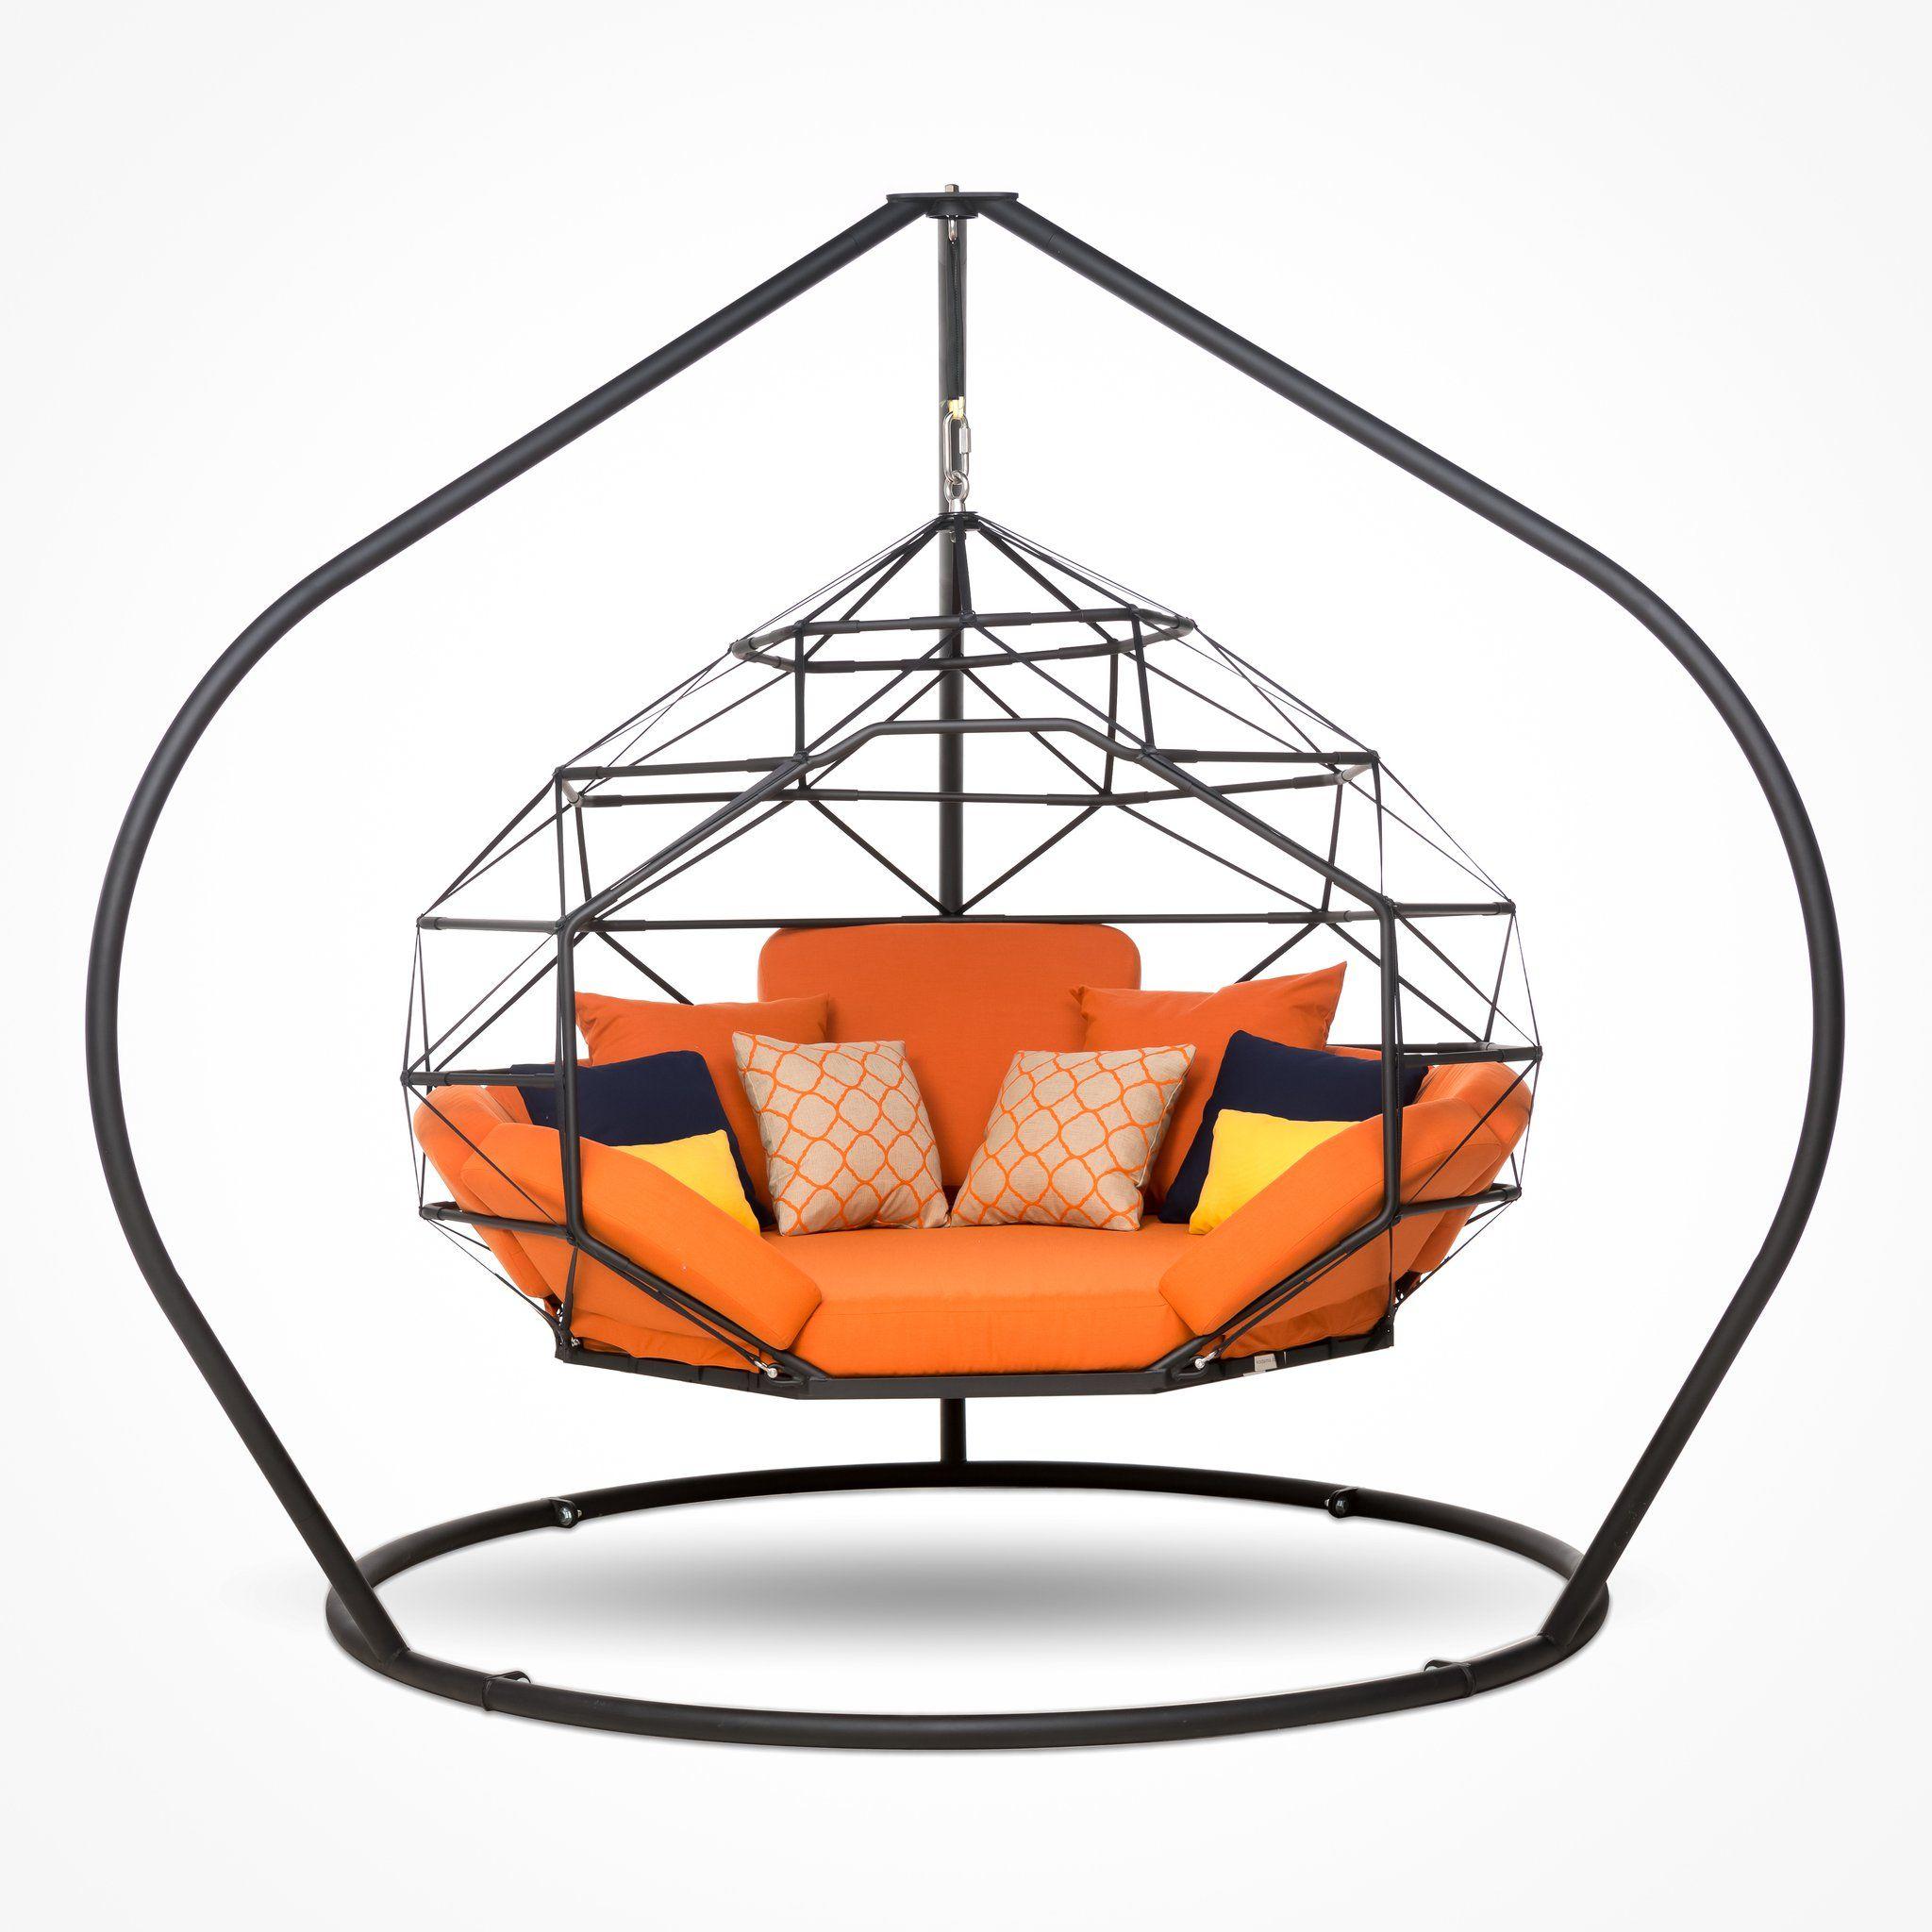 Kodama Zome Hanging furniture, Decor, Hanging tent